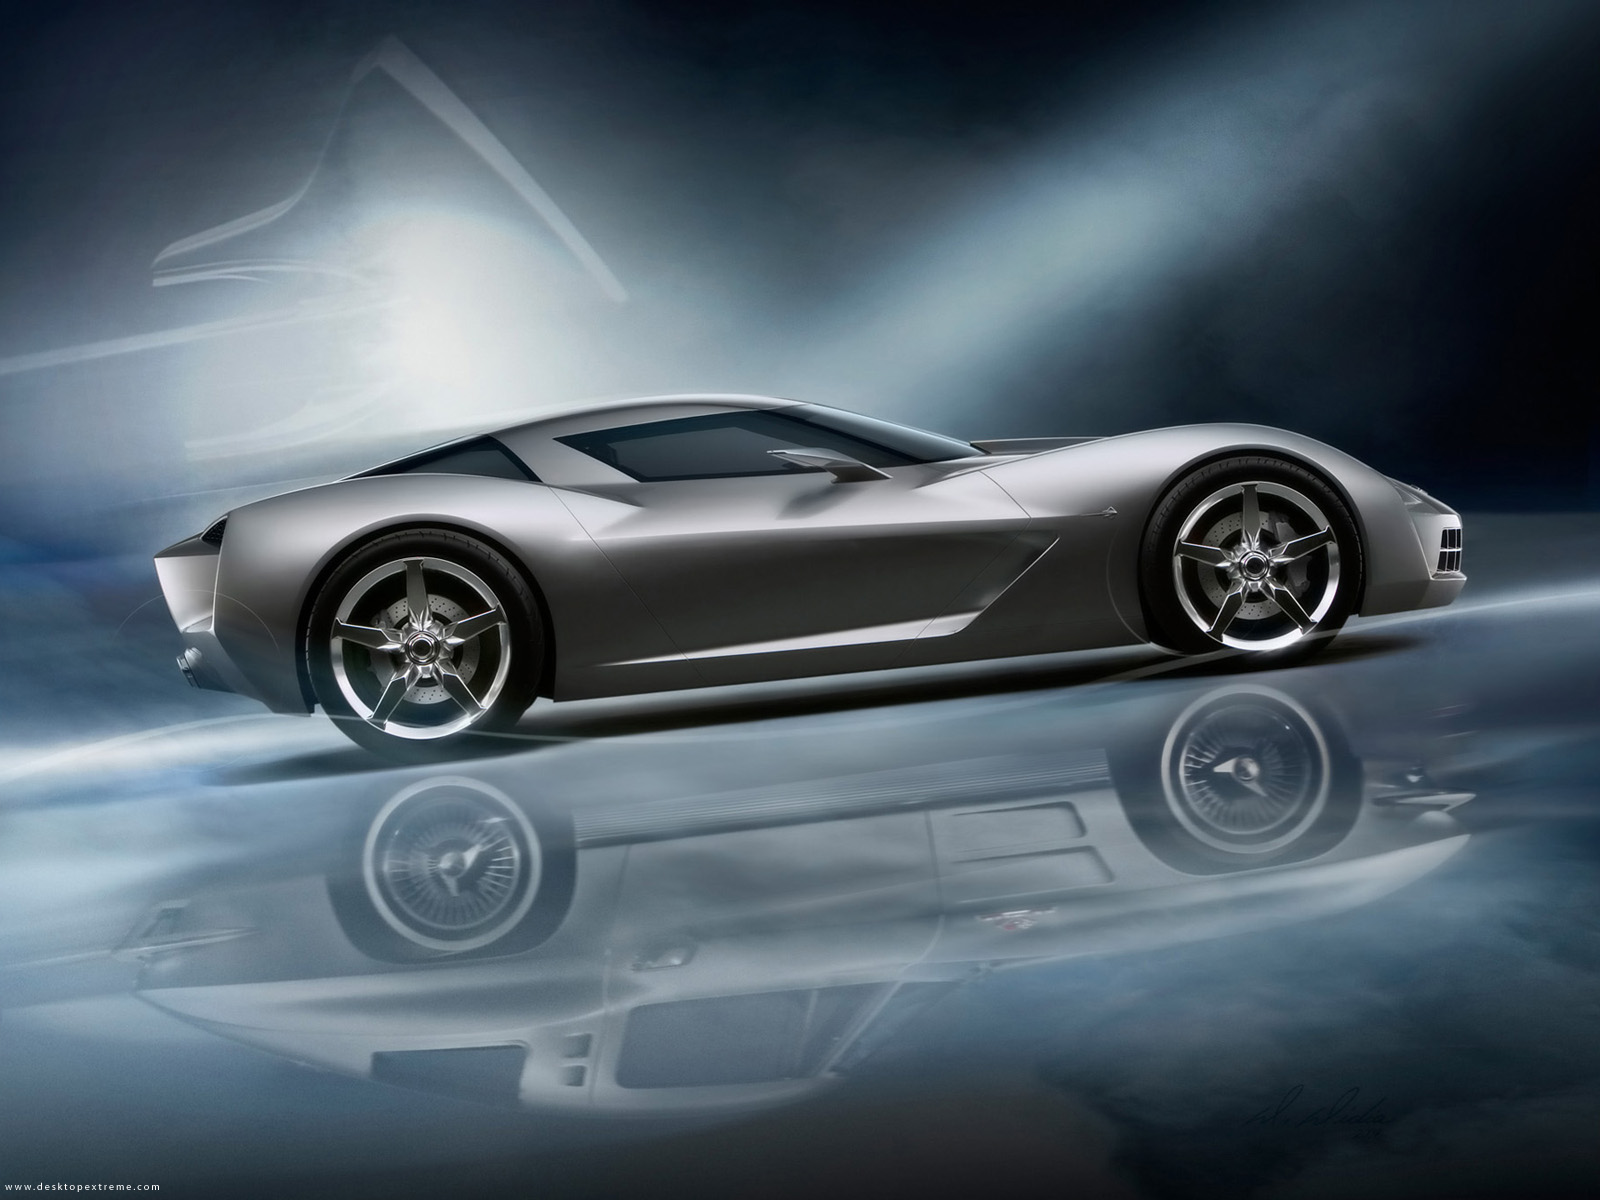 http://2.bp.blogspot.com/-LWW6KTyEJqk/UKI6gLTRhcI/AAAAAAAAG2U/yIcAwW4cnKw/s1600/Chevrolet_Corvette_Stingray_35200933240PM567.jpg